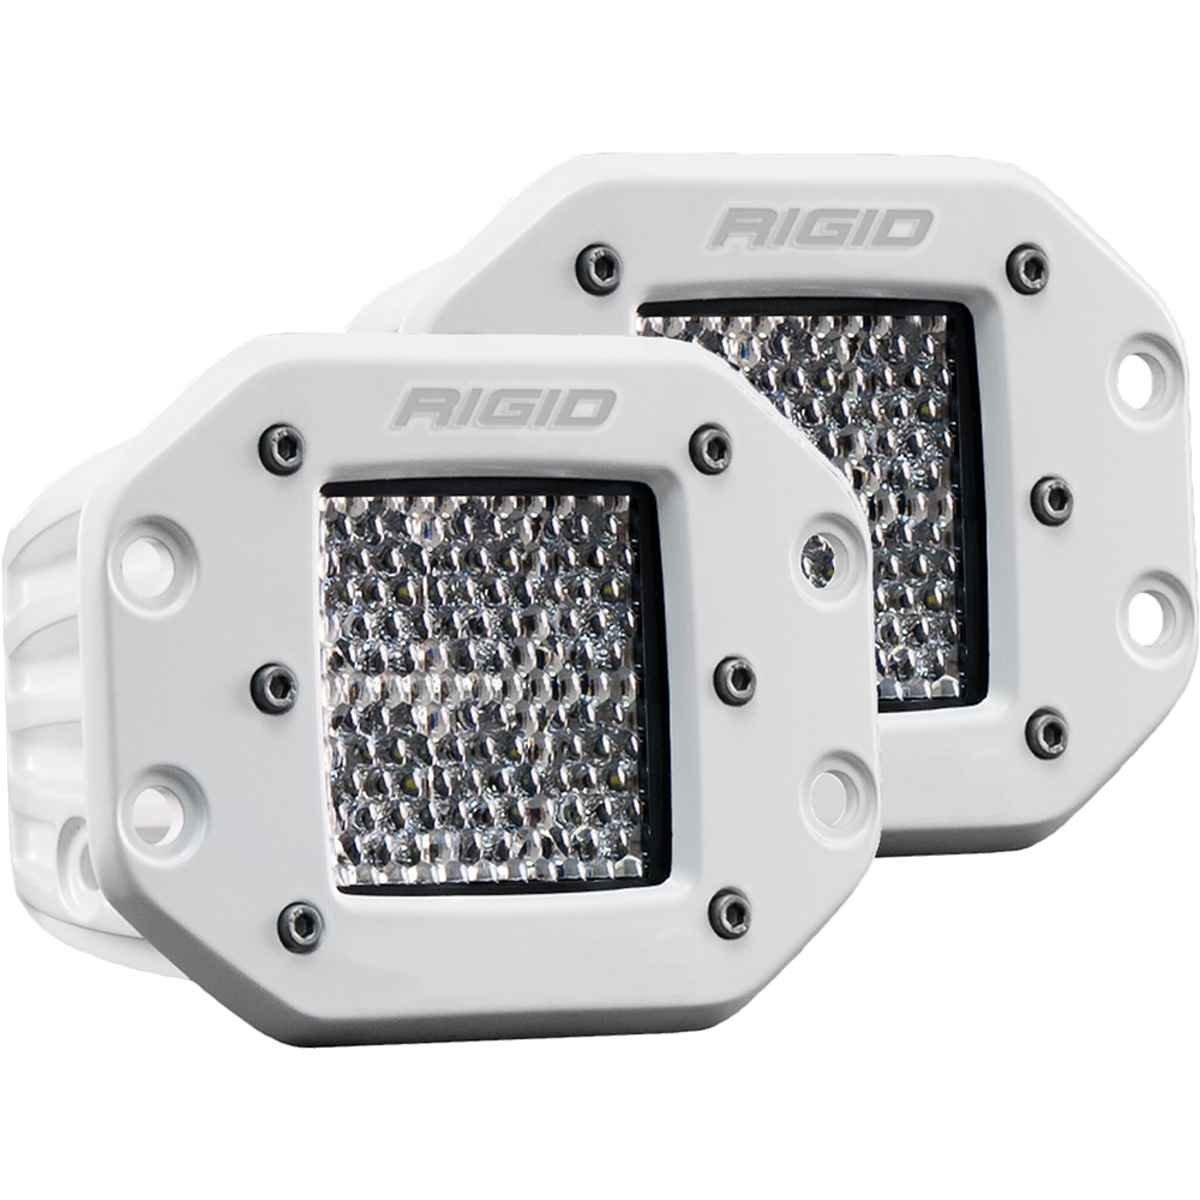 Rigid Industries 712513 M-Series Dually D2 60 Deg. Diffusion LED Light